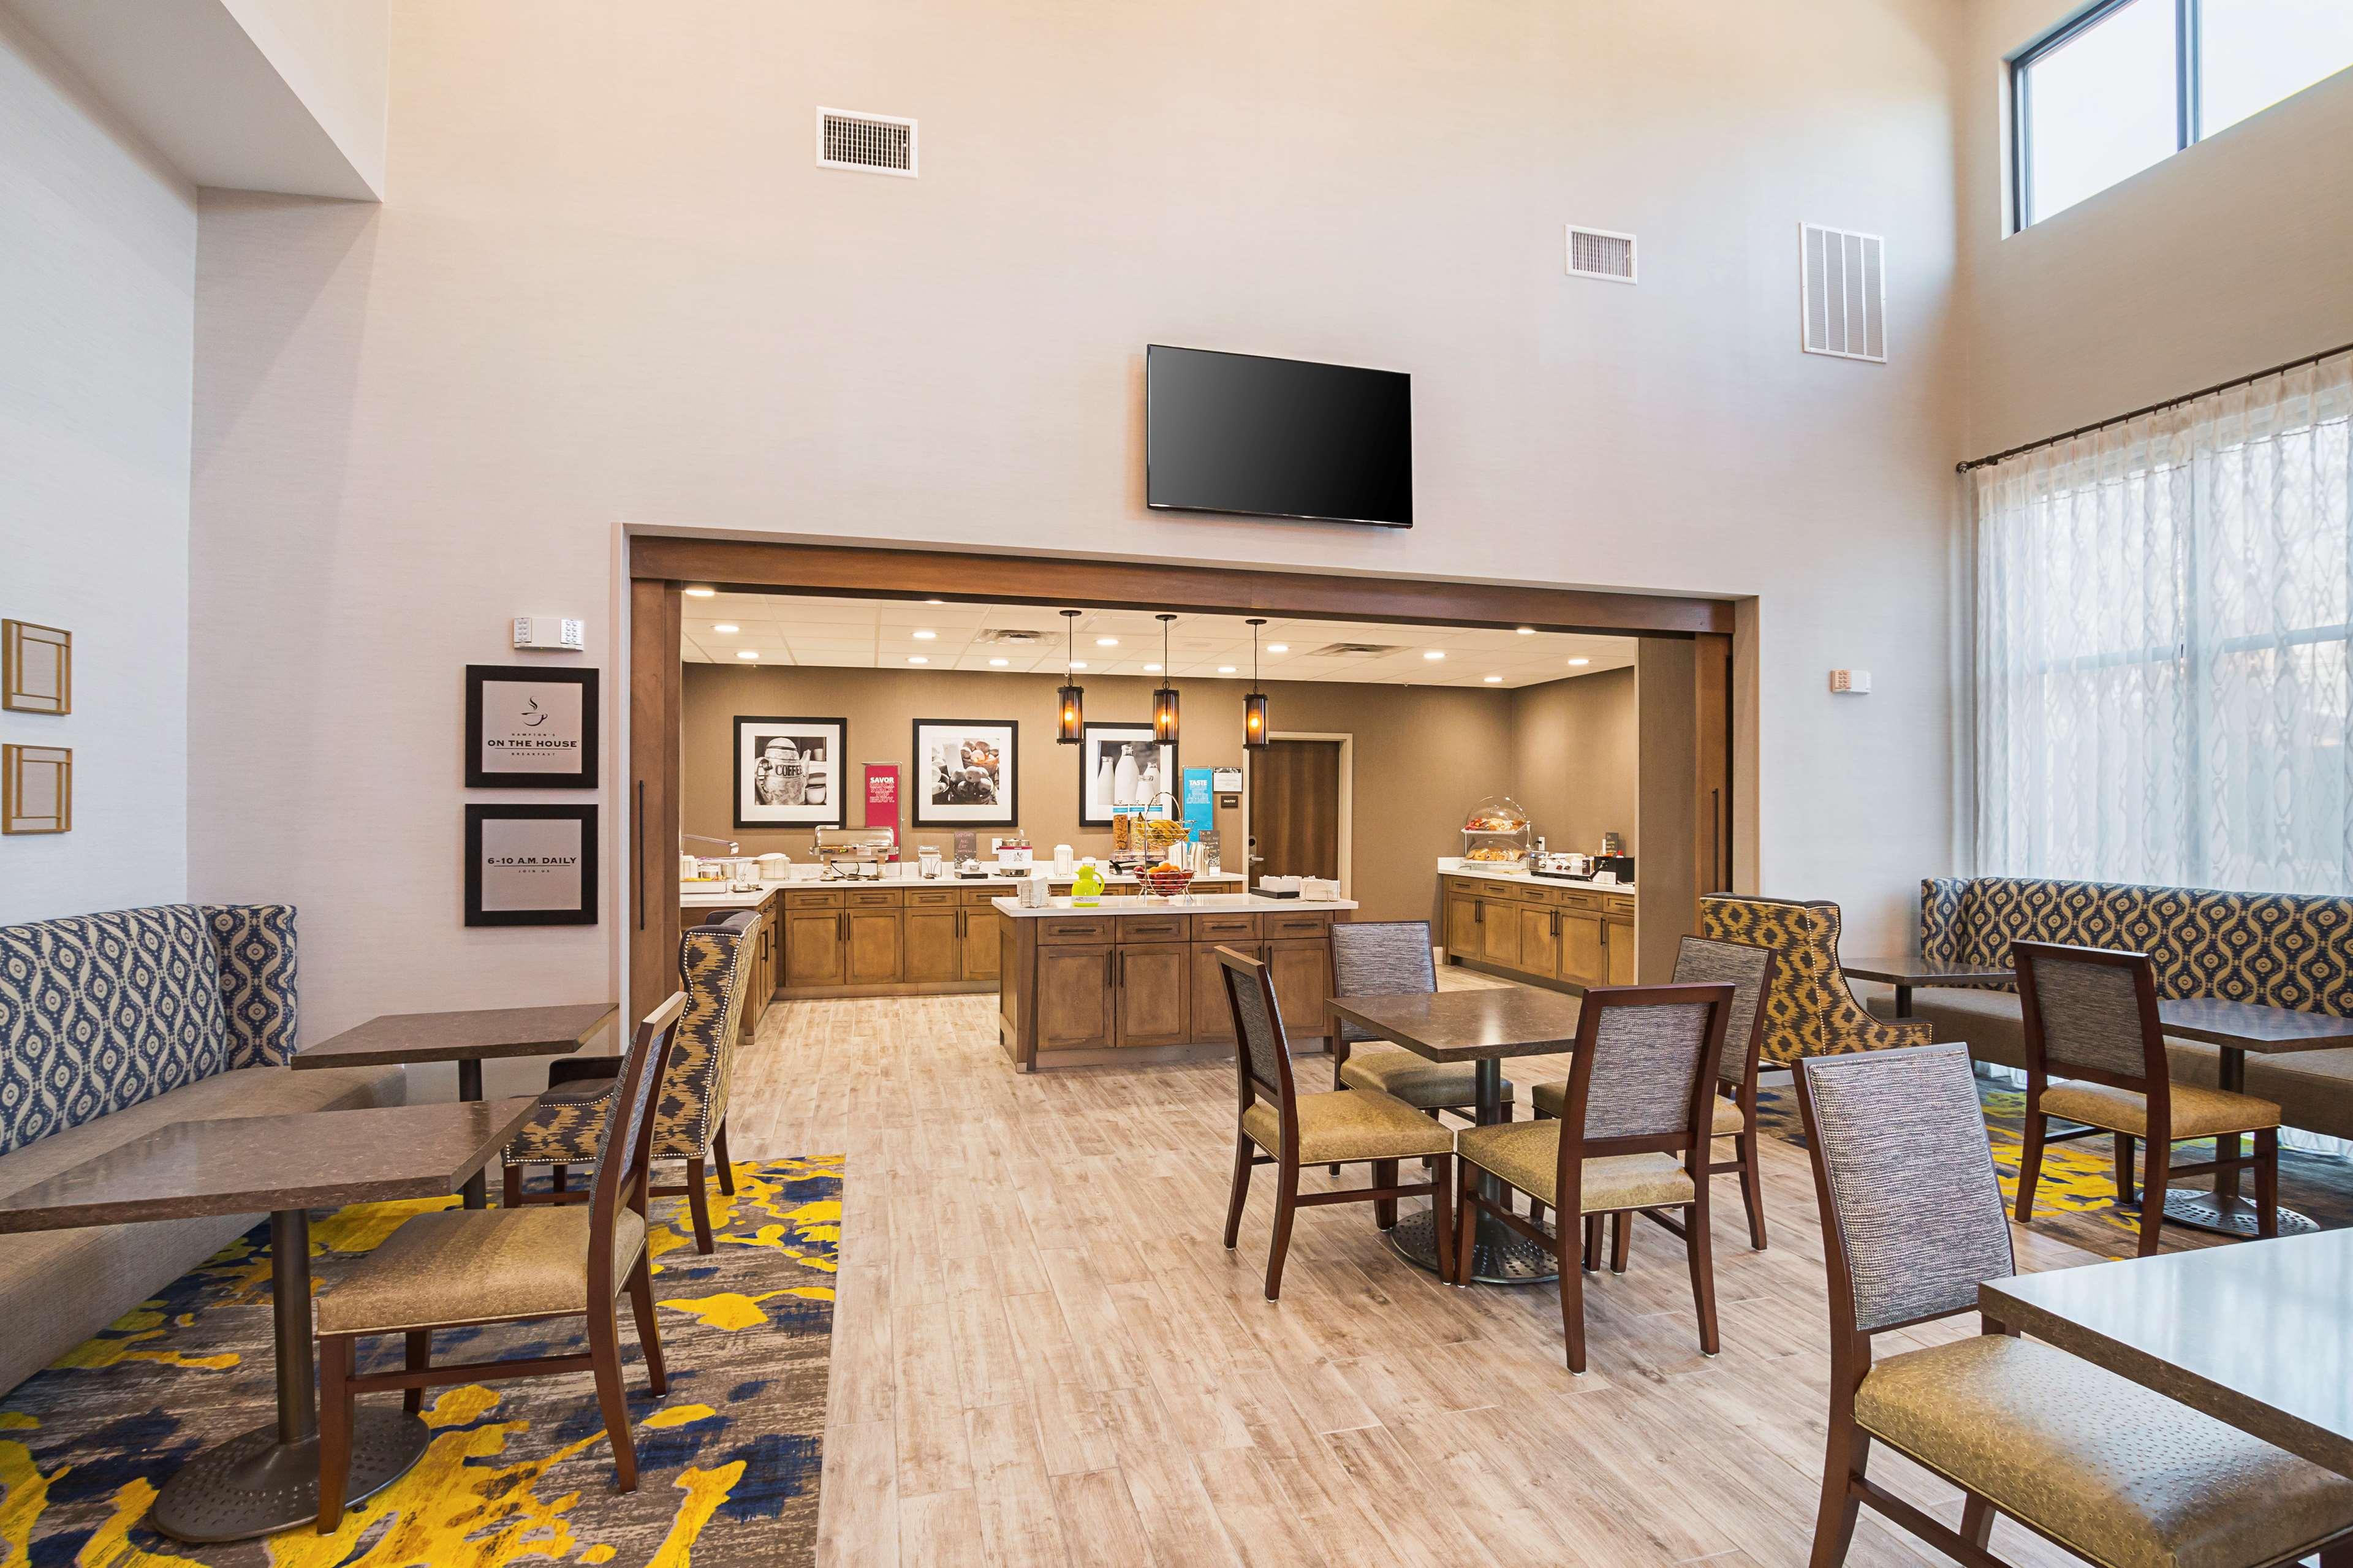 Hampton Inn & Suites Colleyville DFW West image 11